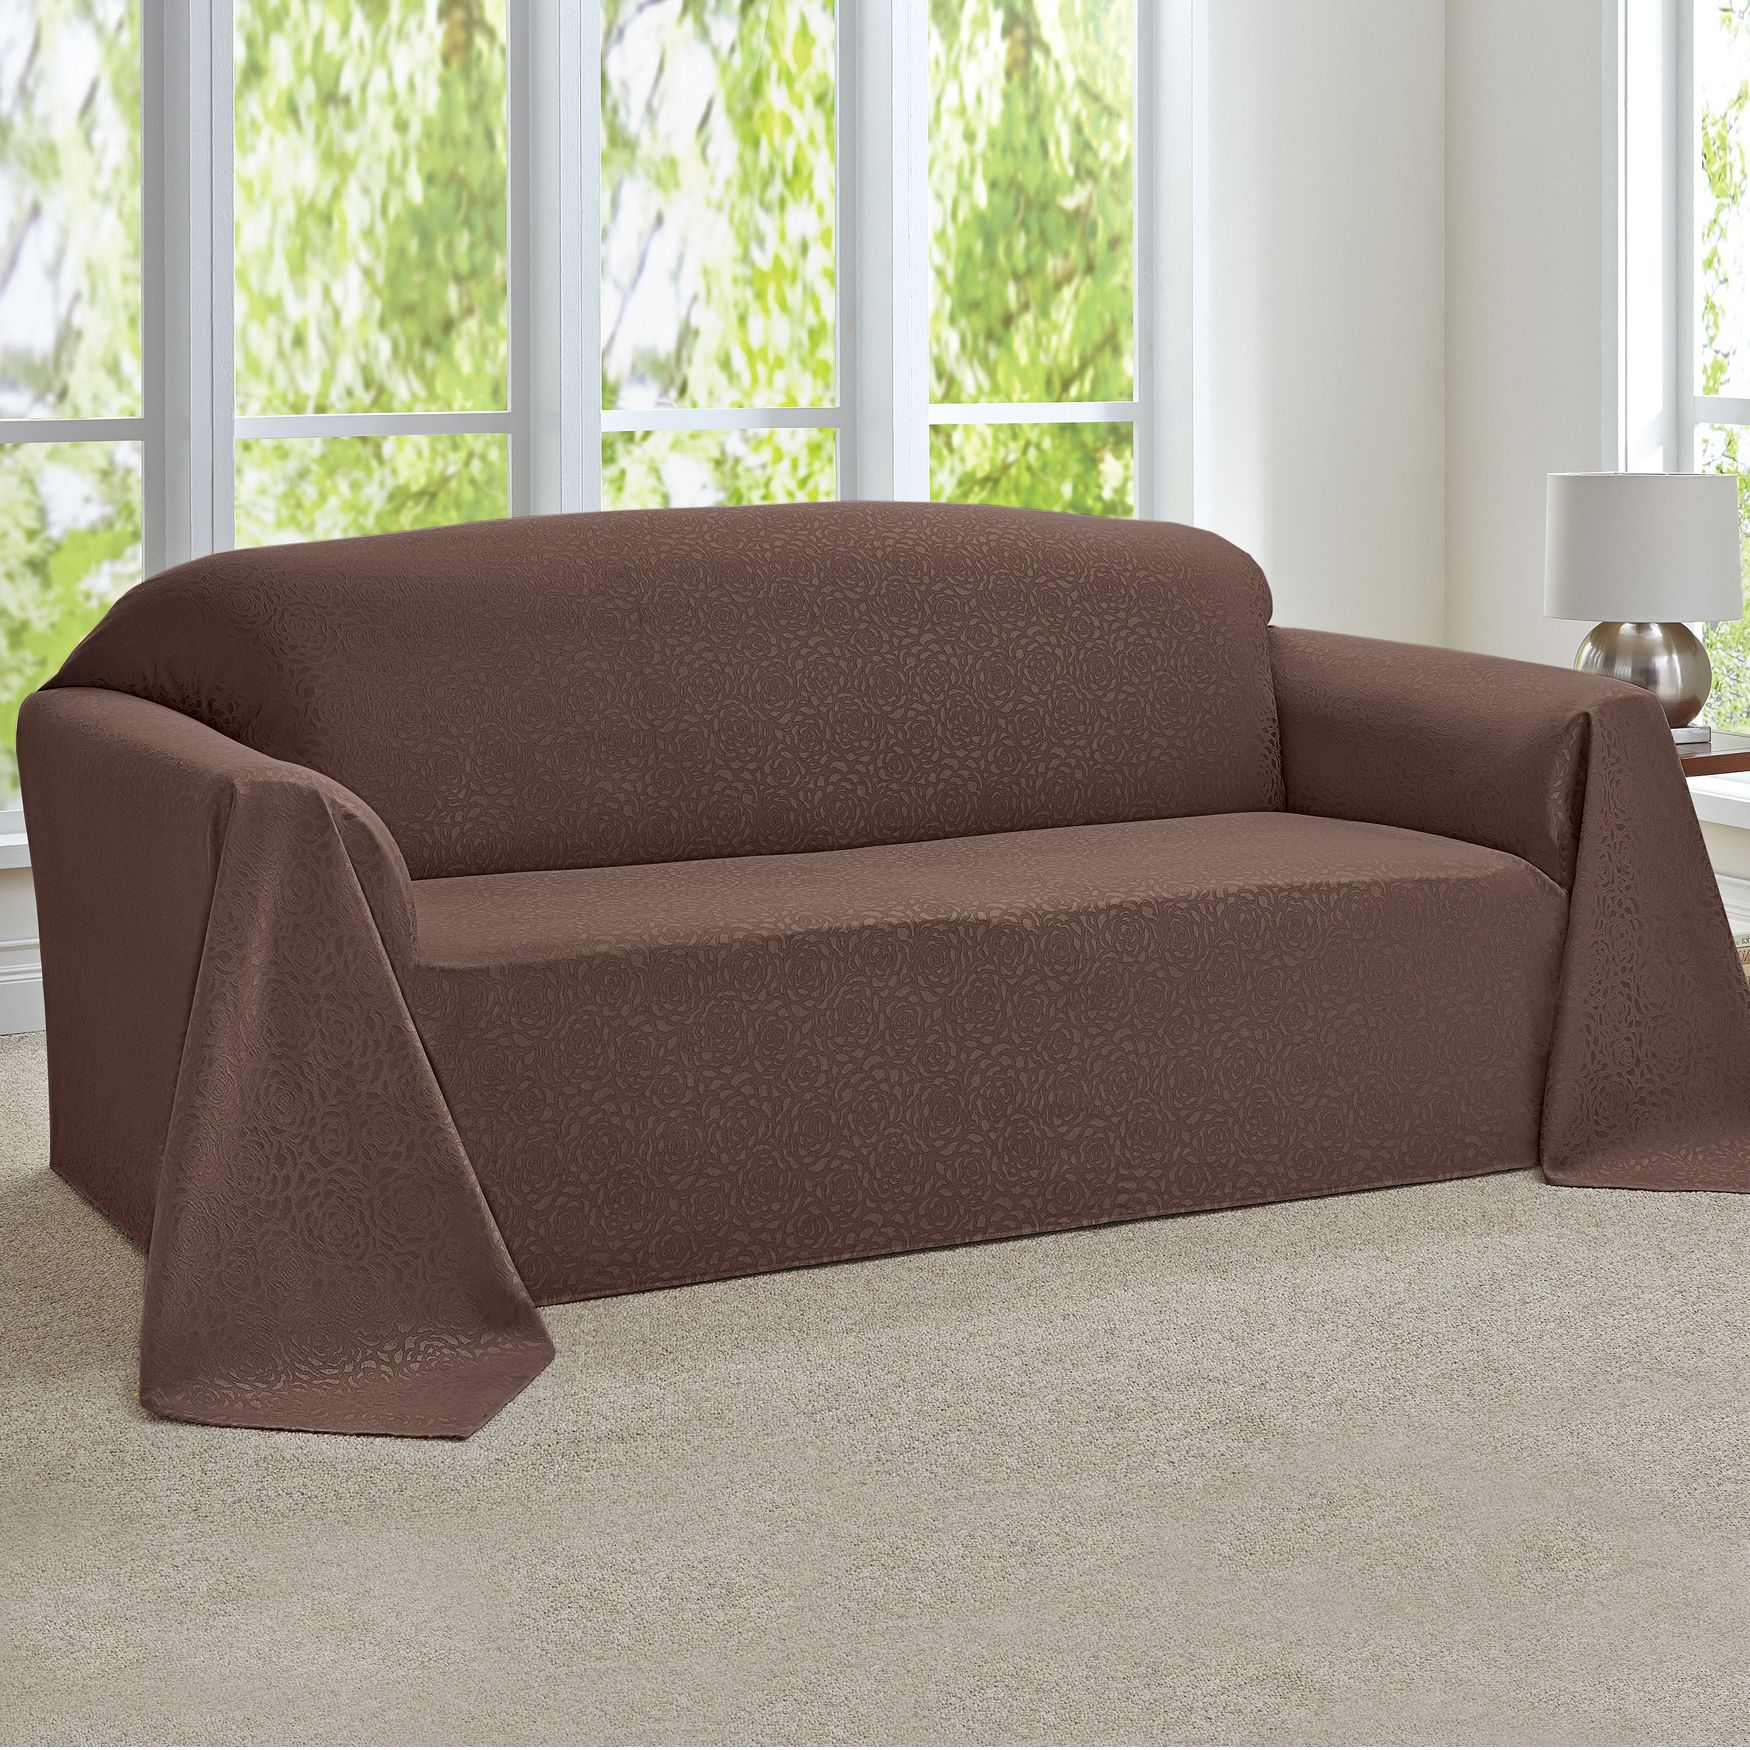 Rosanna Jacquard Extra Long Sofa Throw Slipcover